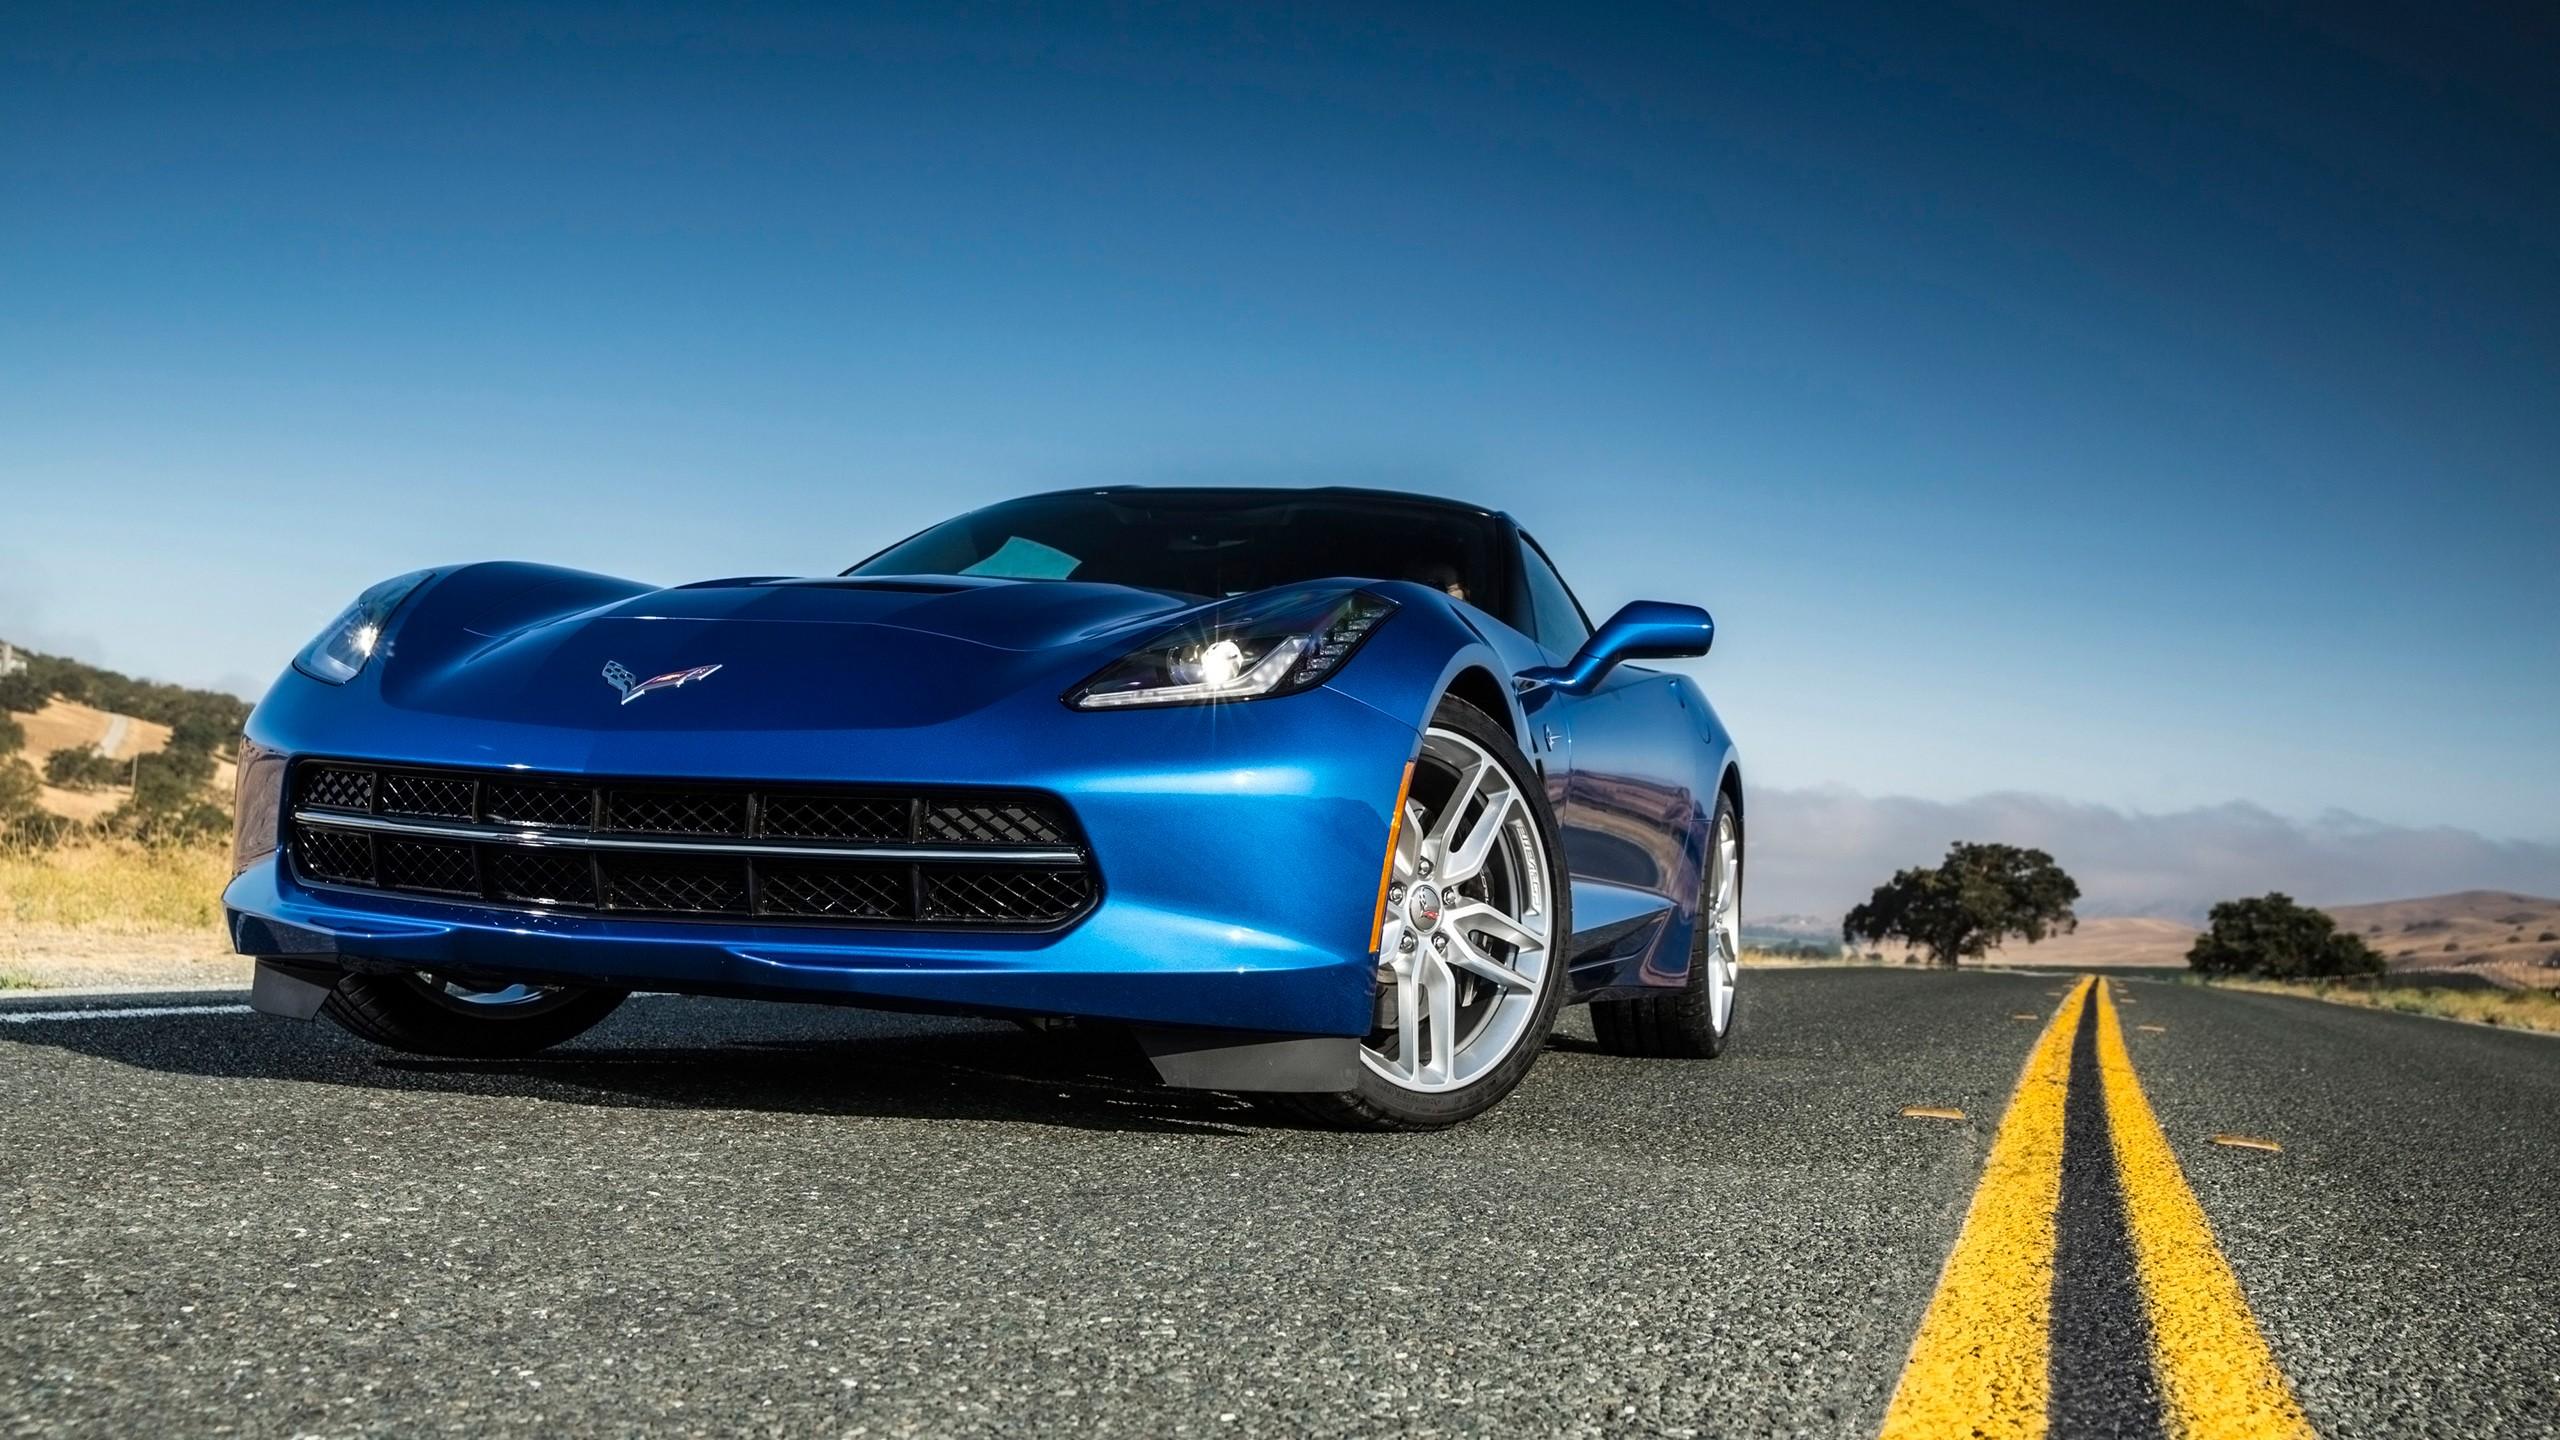 2014 chevrolet corvette stingray blue wallpaper hd car